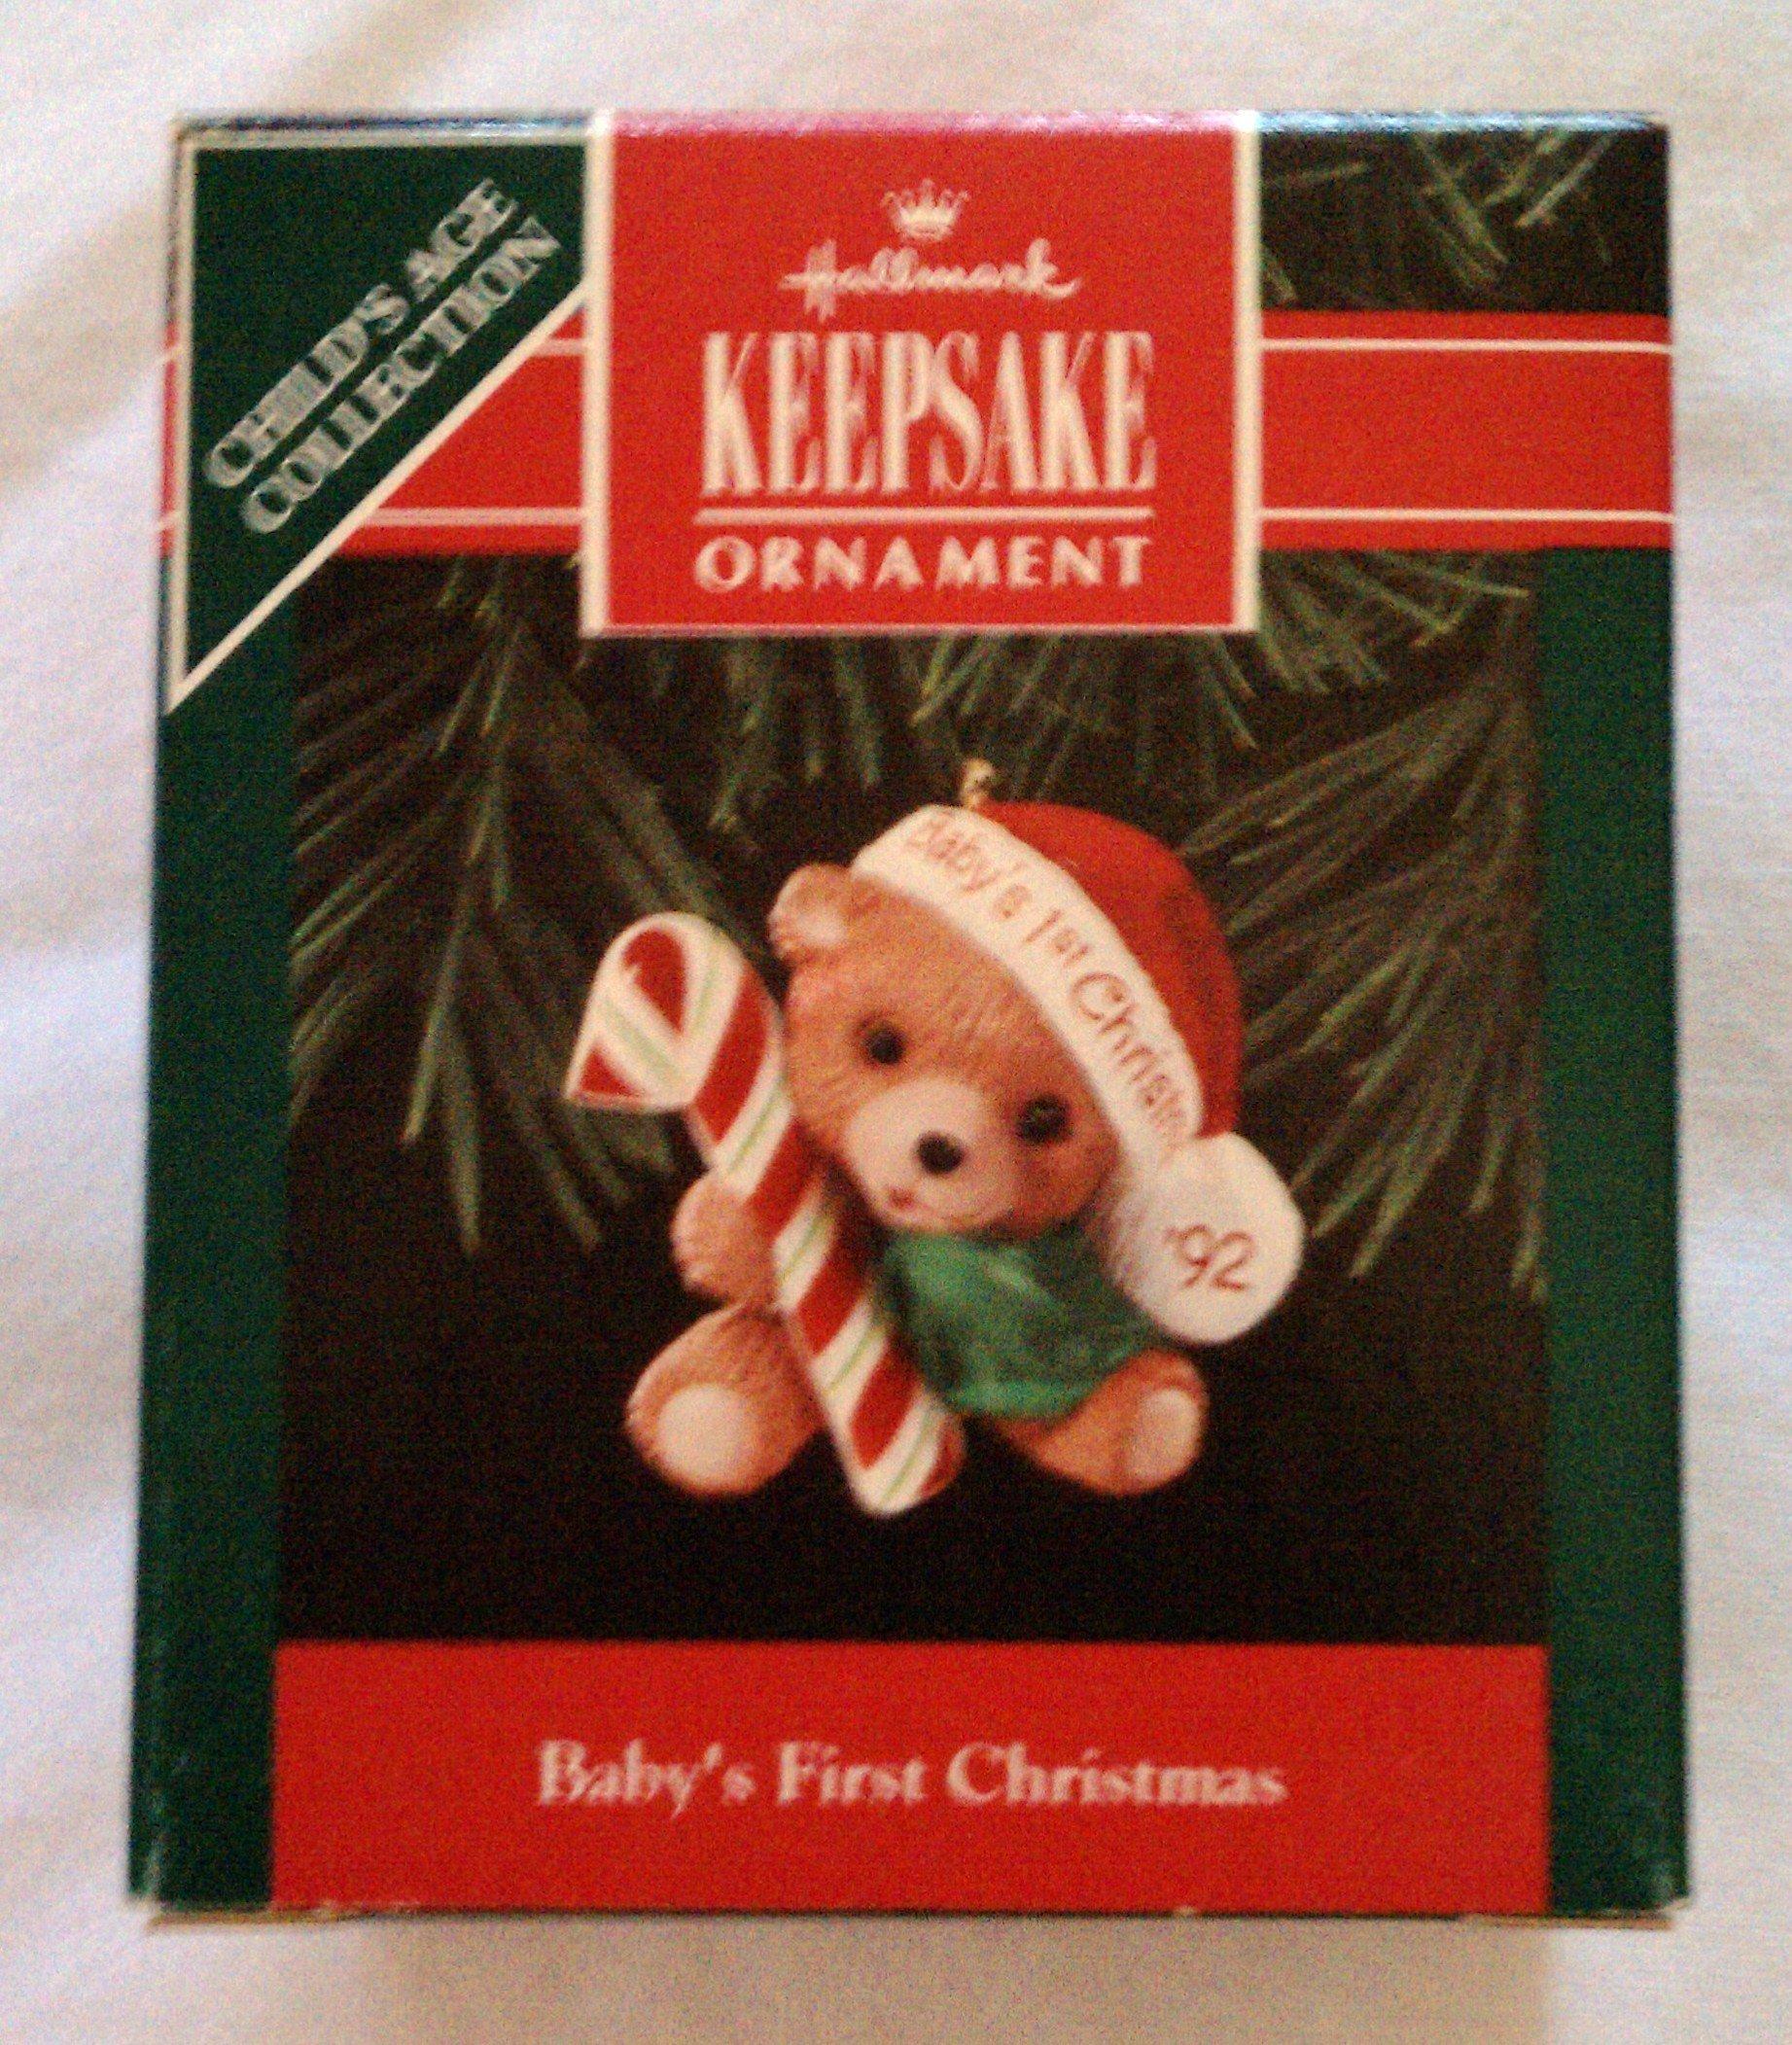 Hallmark 1992 Baby's First Christmas Keepsake Ornament QX4644